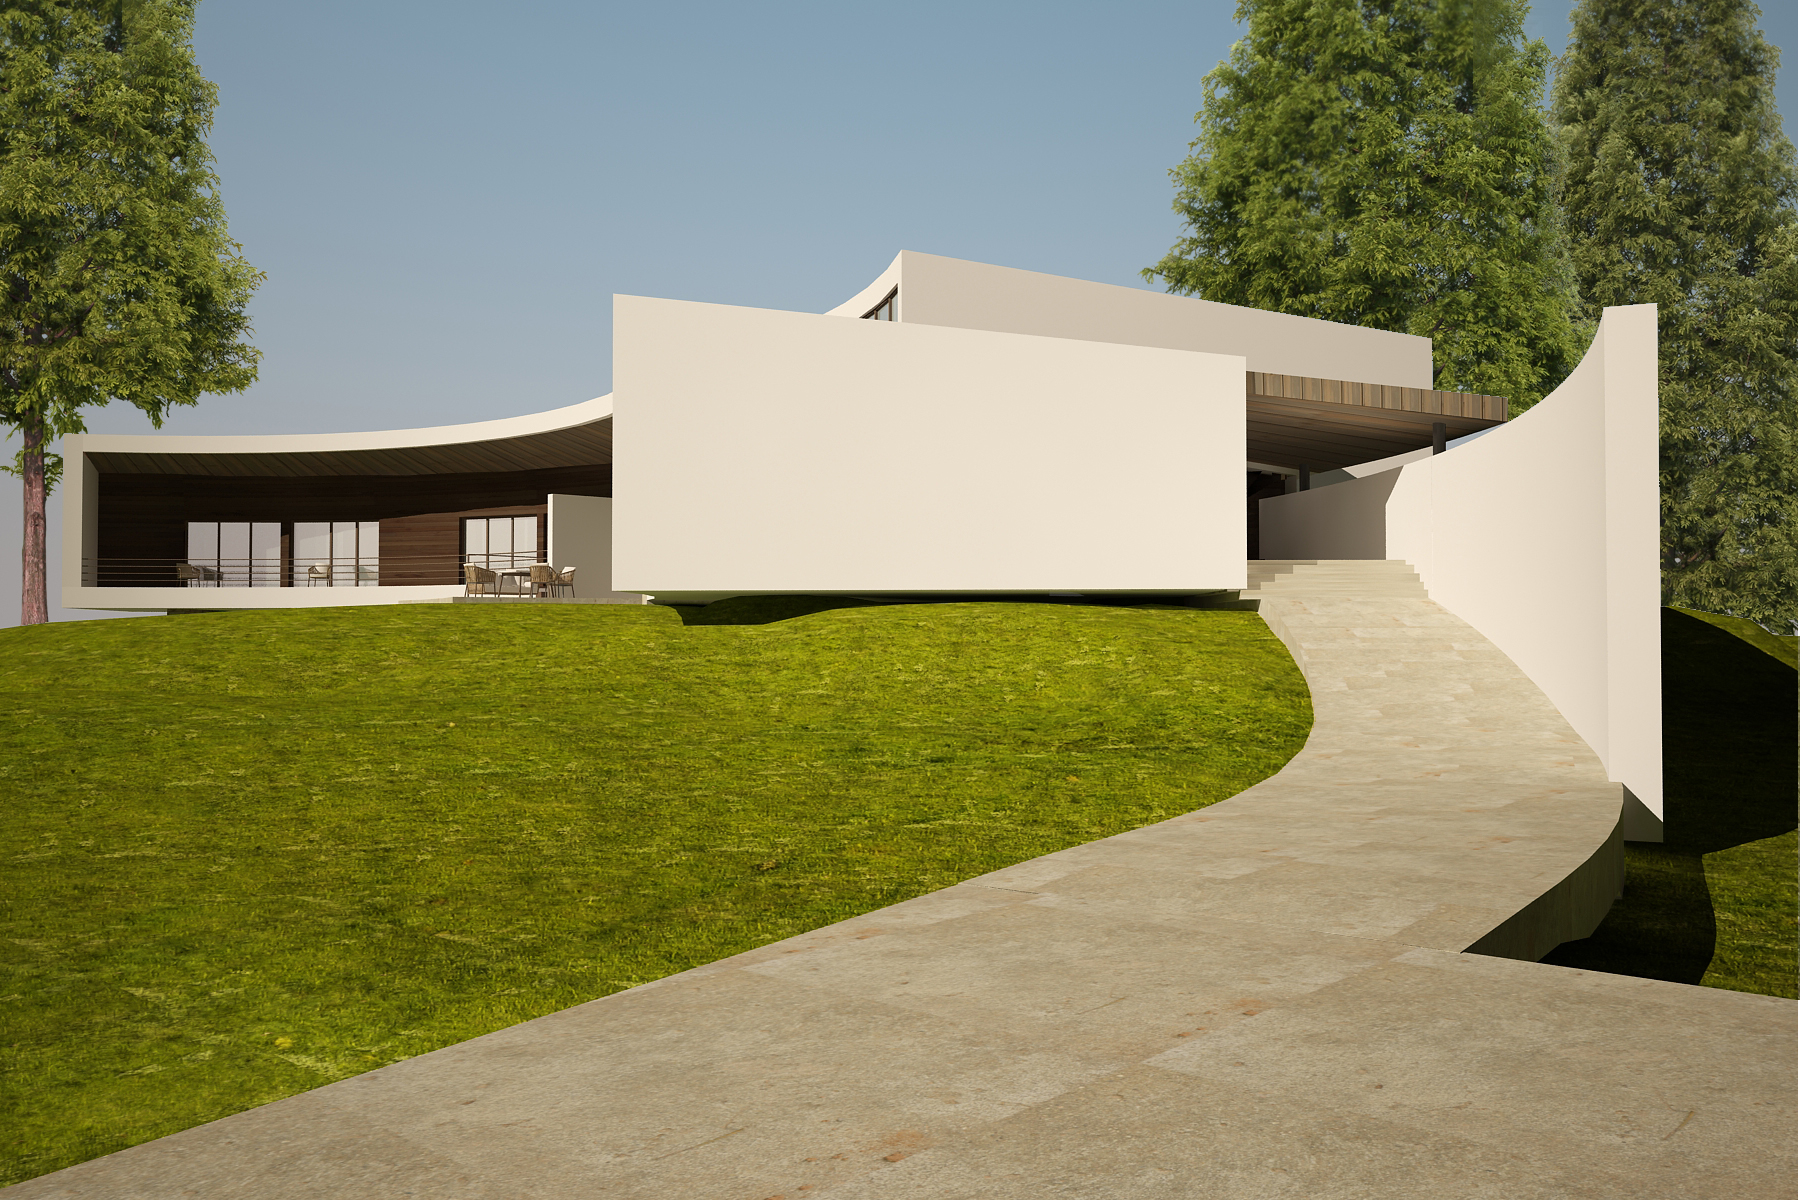 https://nbc-arhitect.ro/wp-content/uploads/2020/10/NBC-Arhitect-_-Breaza-House-_-Breaza-Romania-_-exterior-view_4.jpg